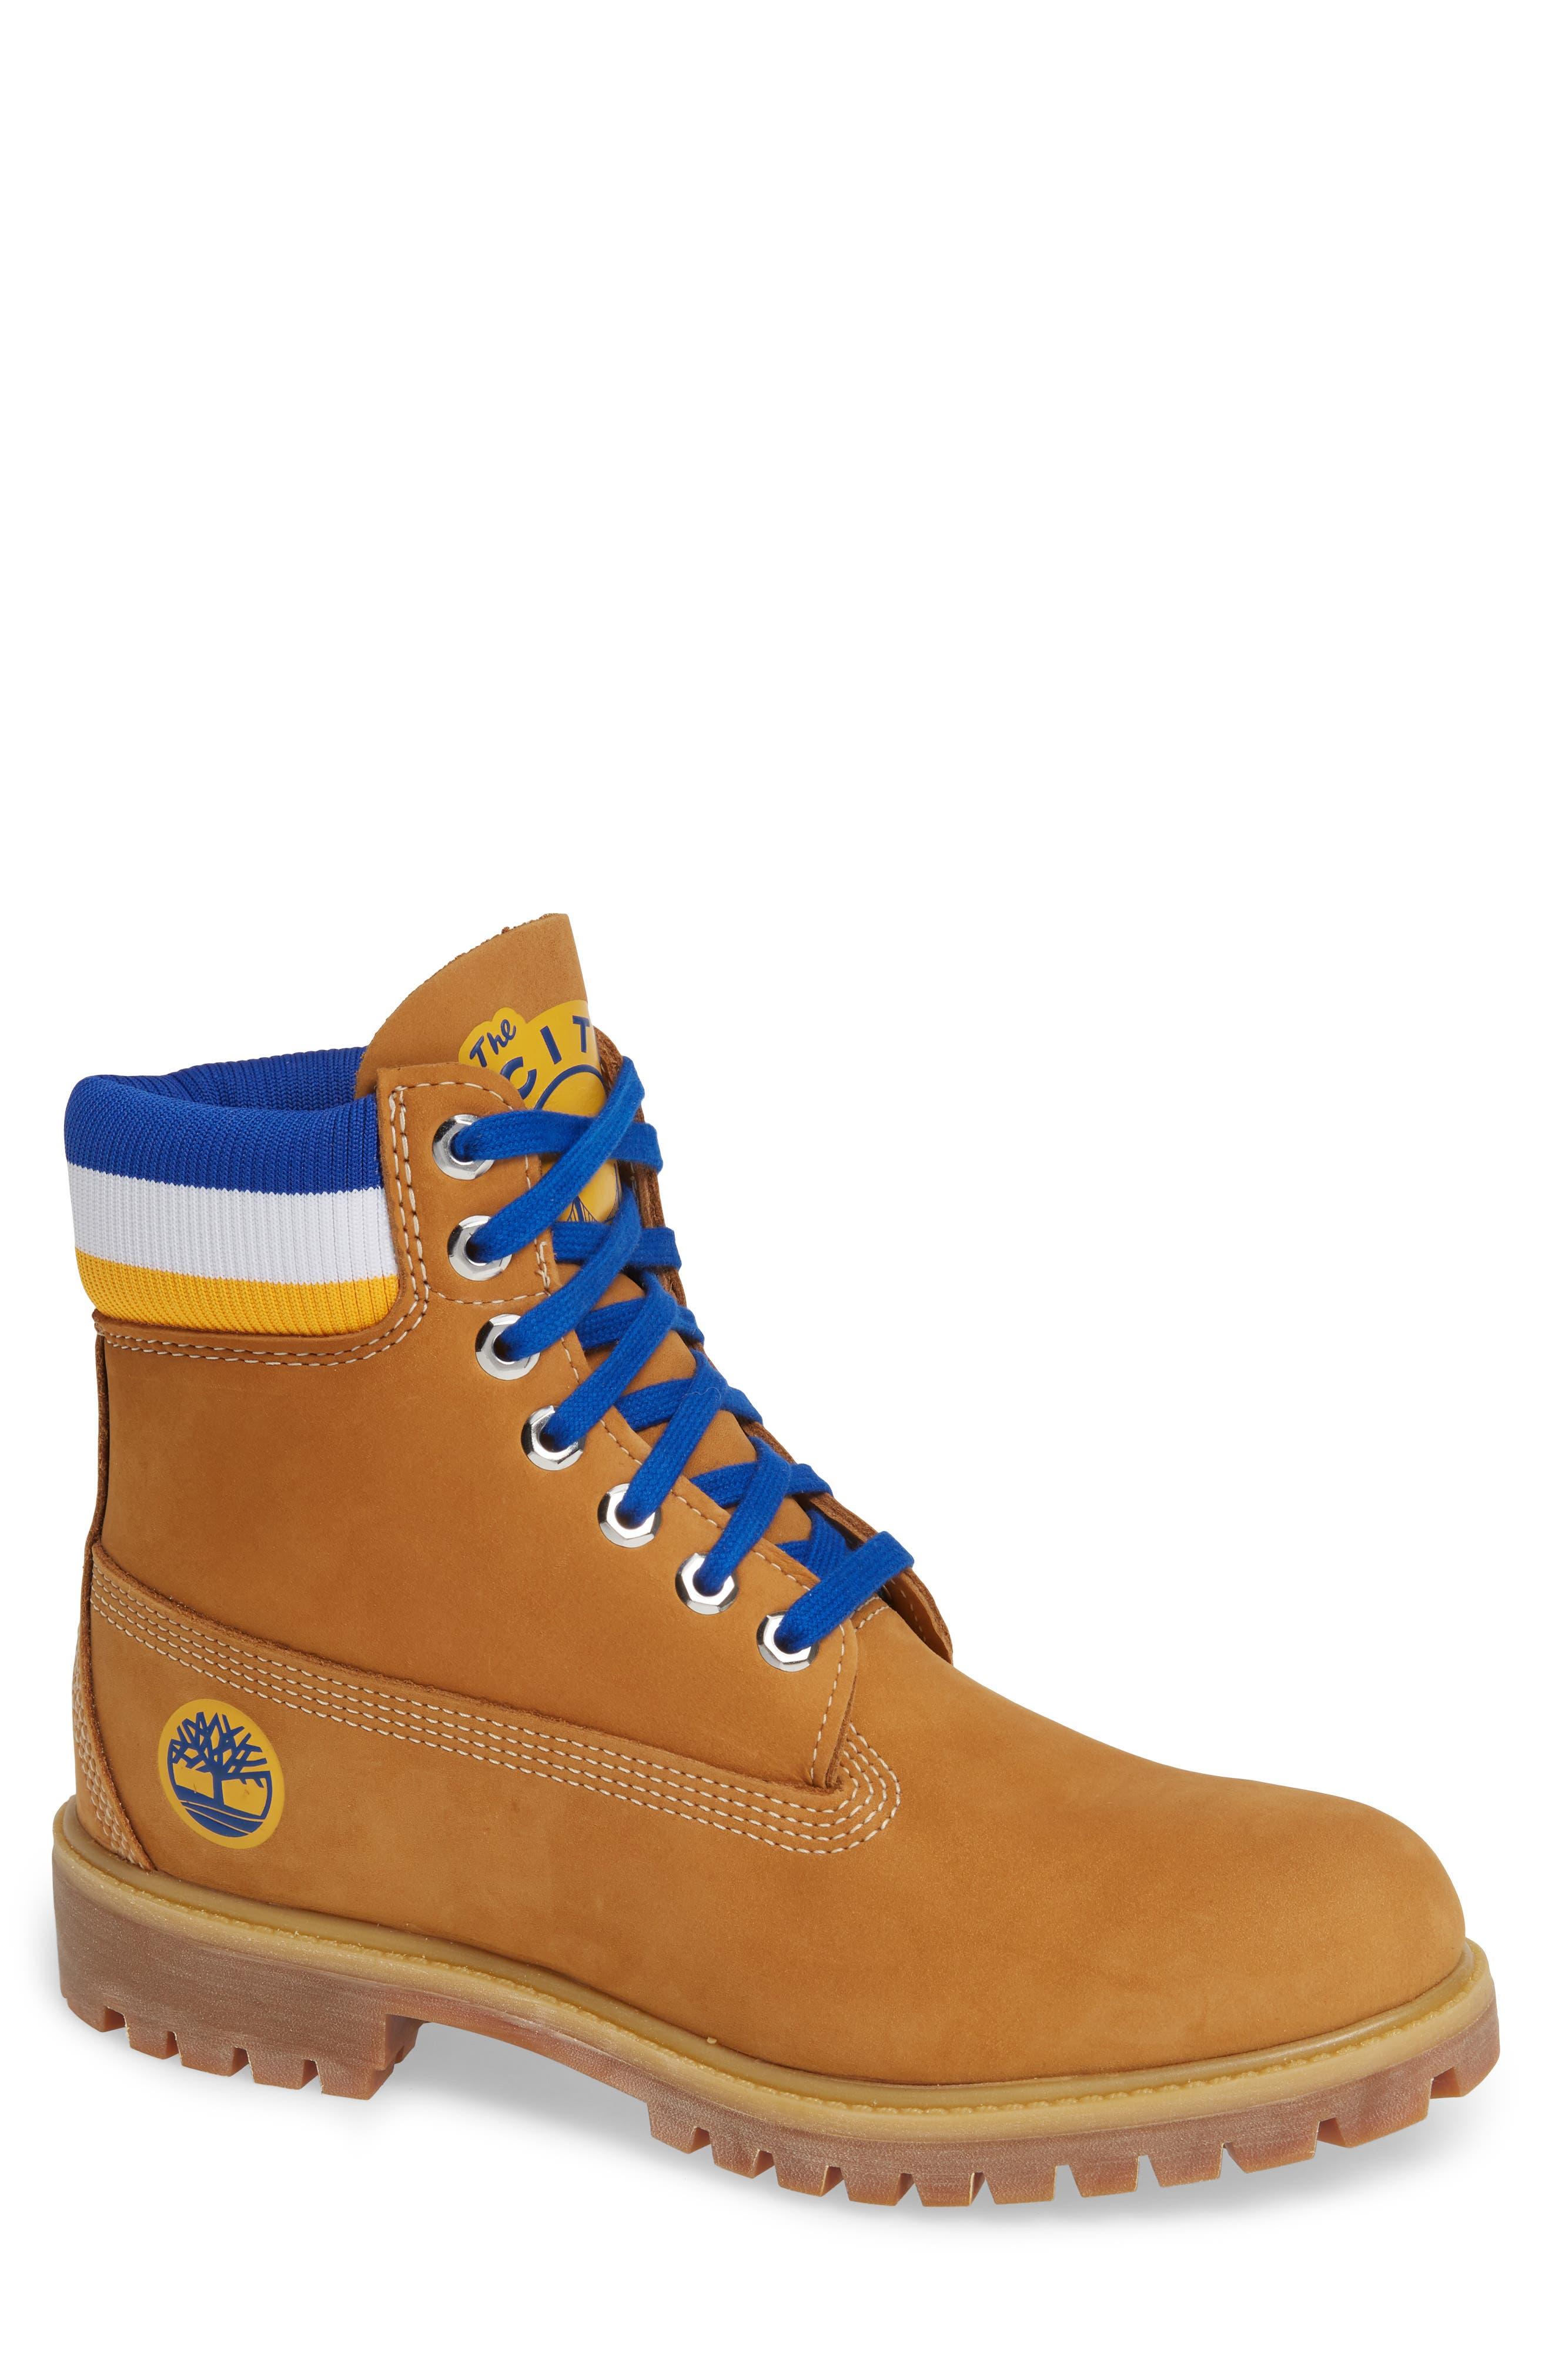 Timberland Premium Nba Collection Boot- Brown